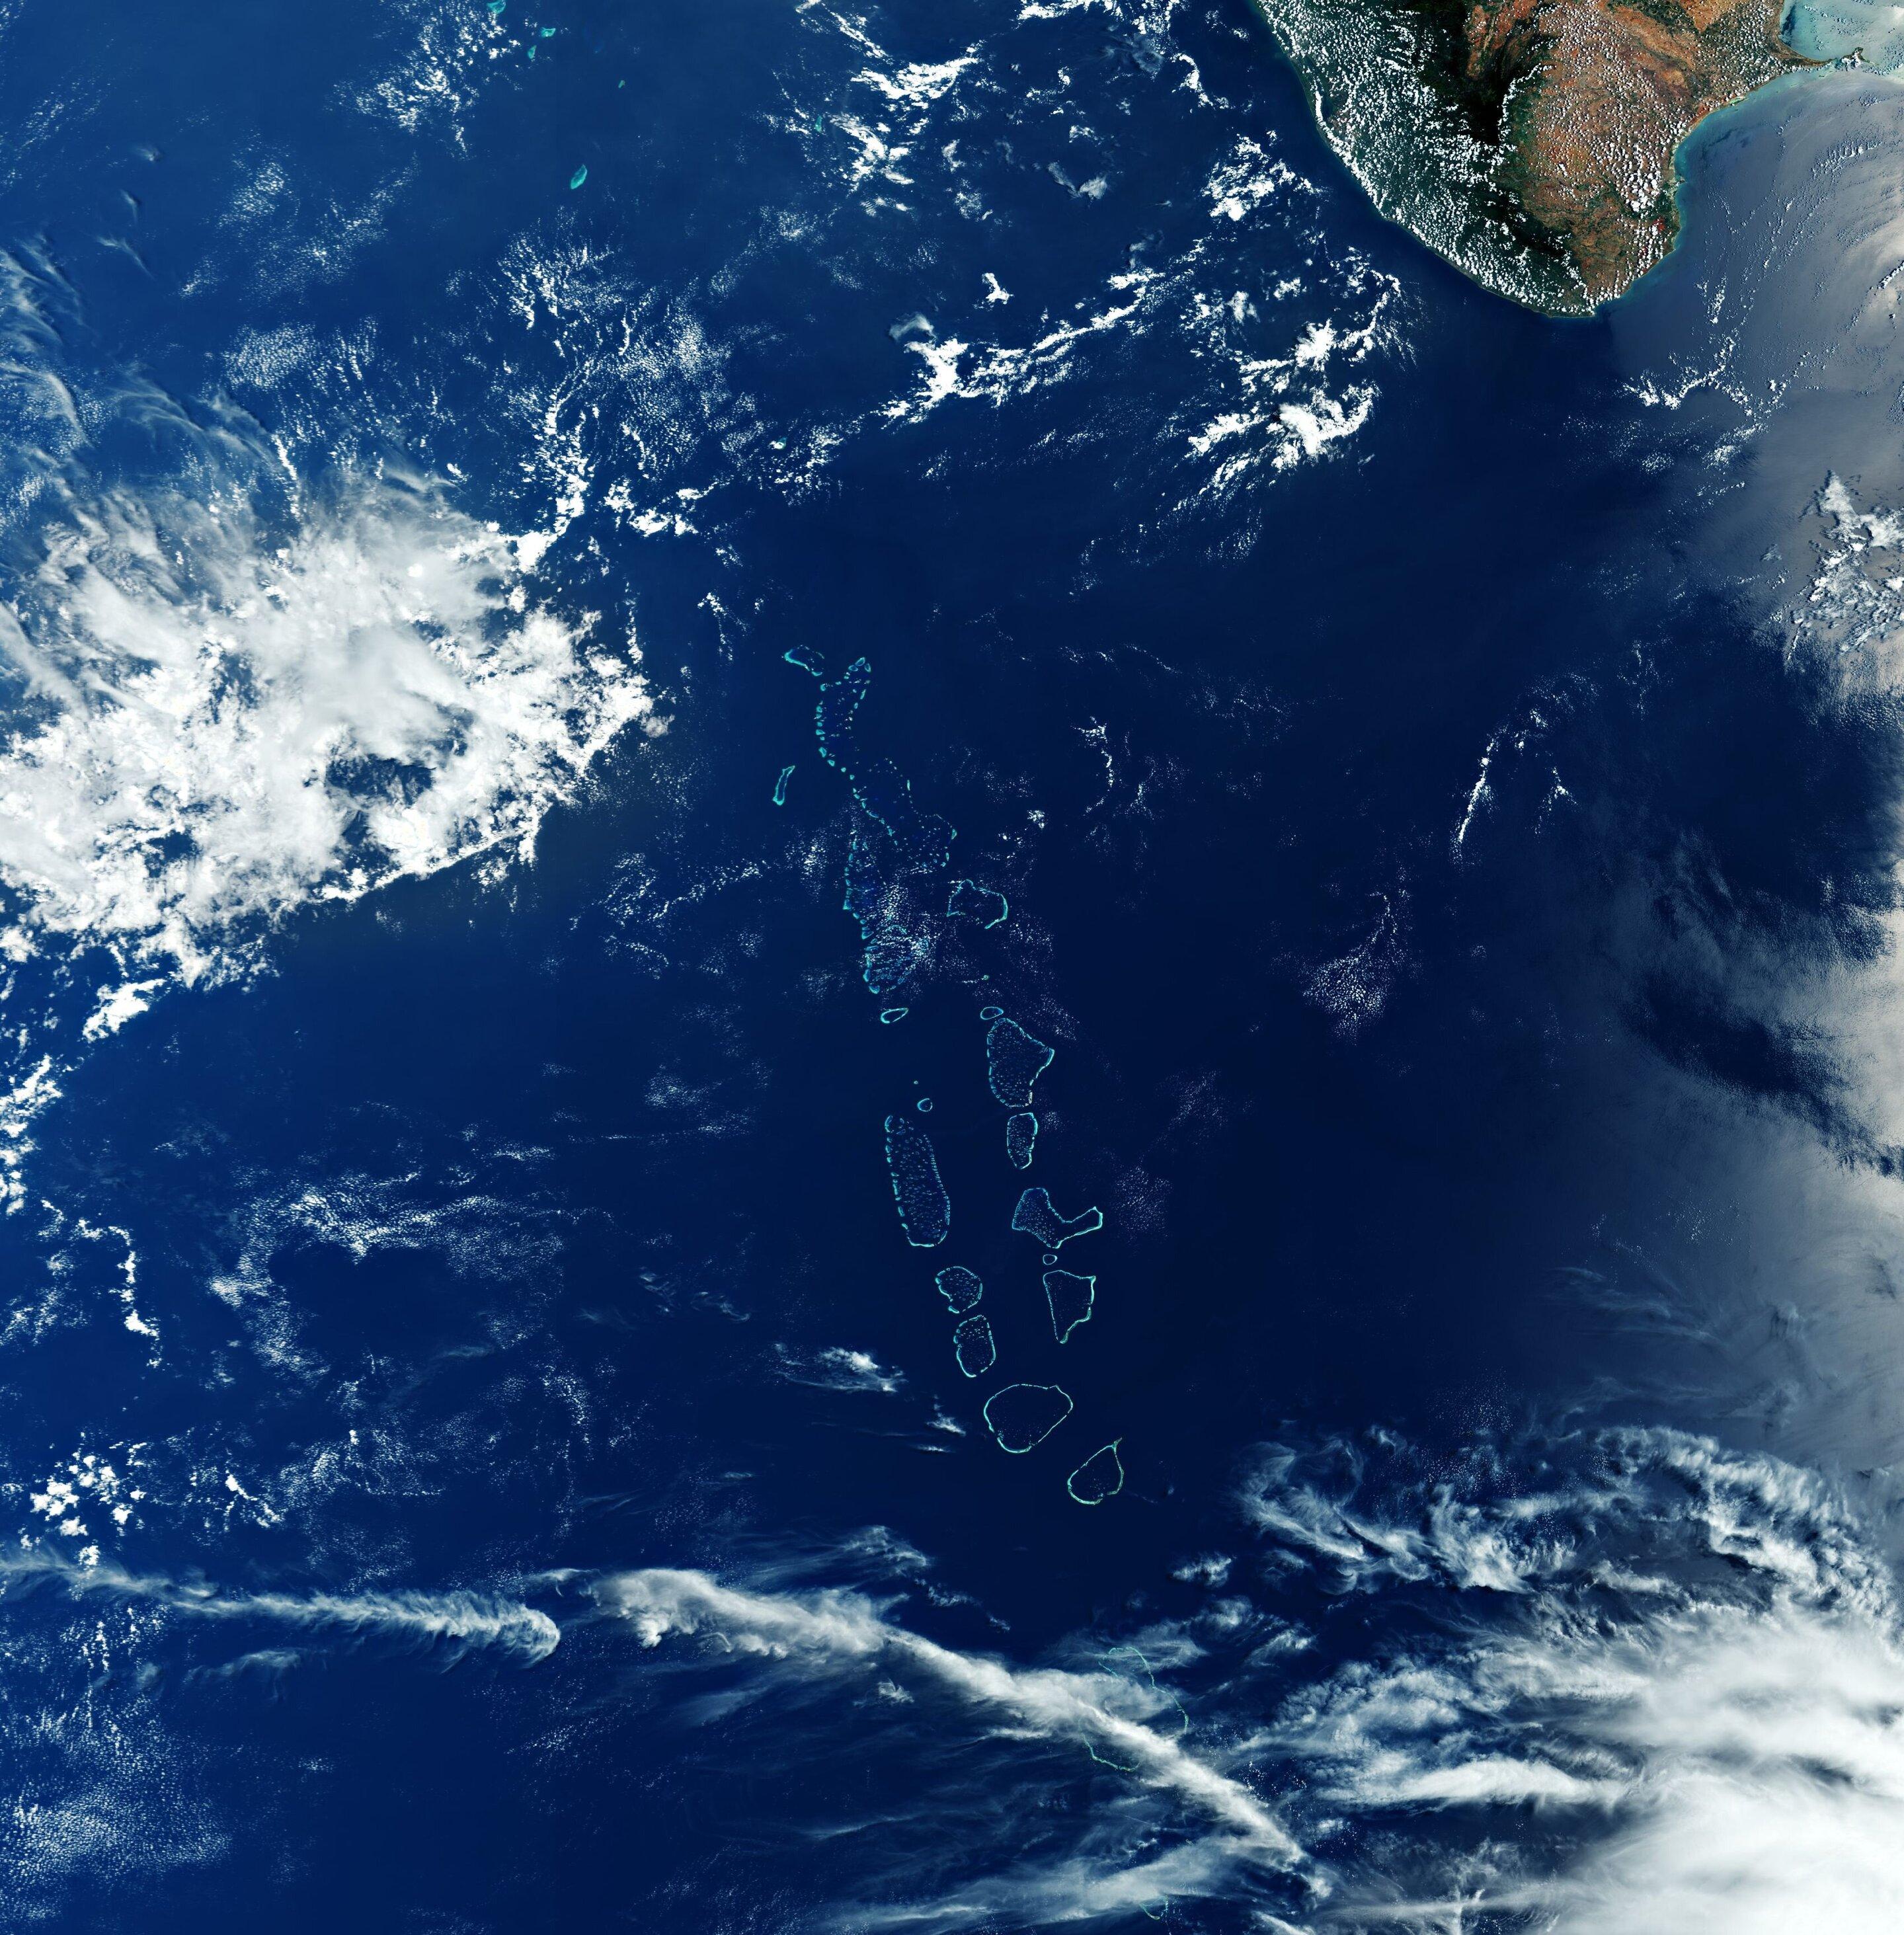 Copernicus captures image of the Republic of Maldives